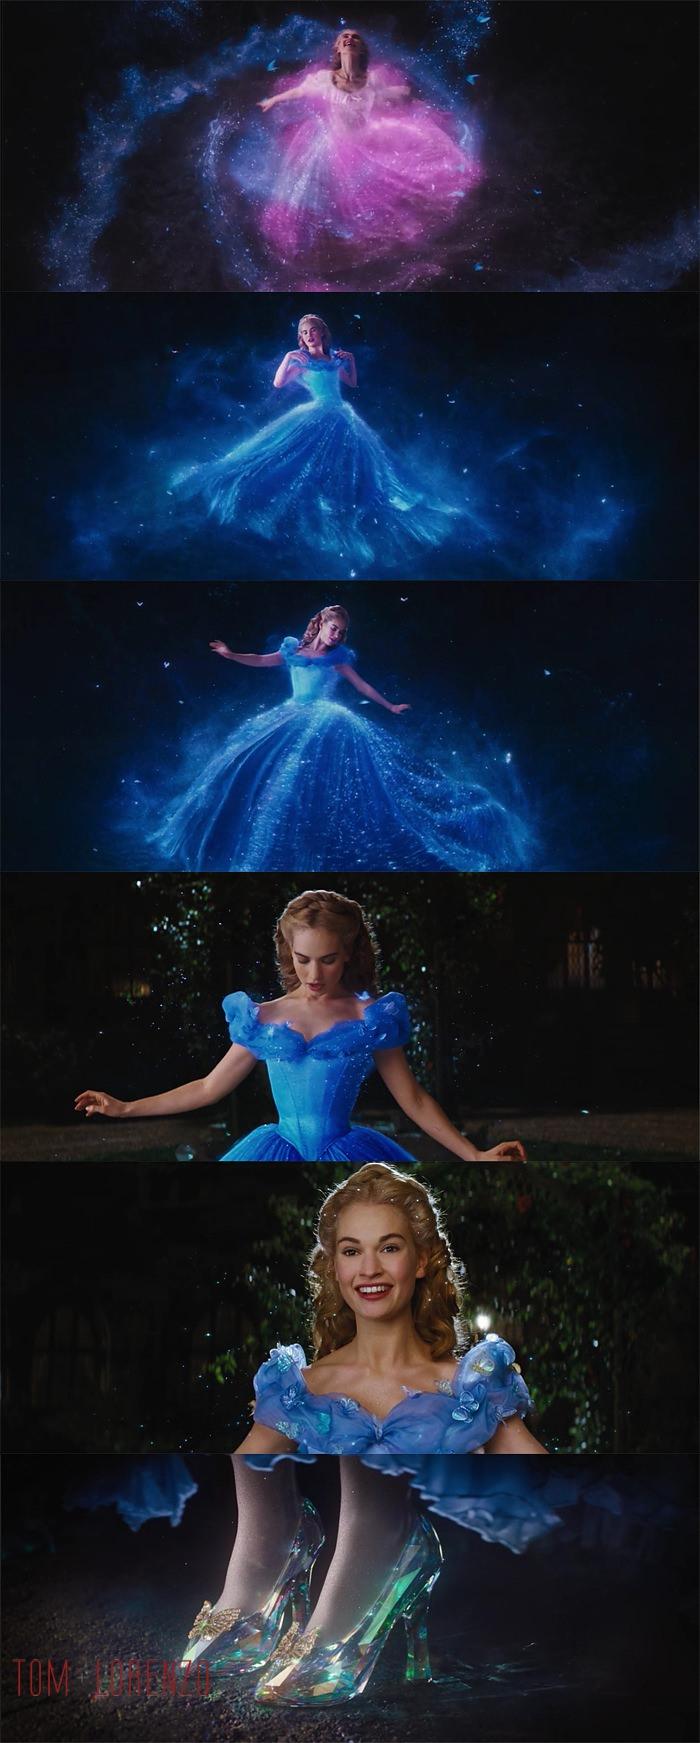 Cinderella-Style-Part-2-Movie-Costumes-Tom-Lorenzo-Site (5)